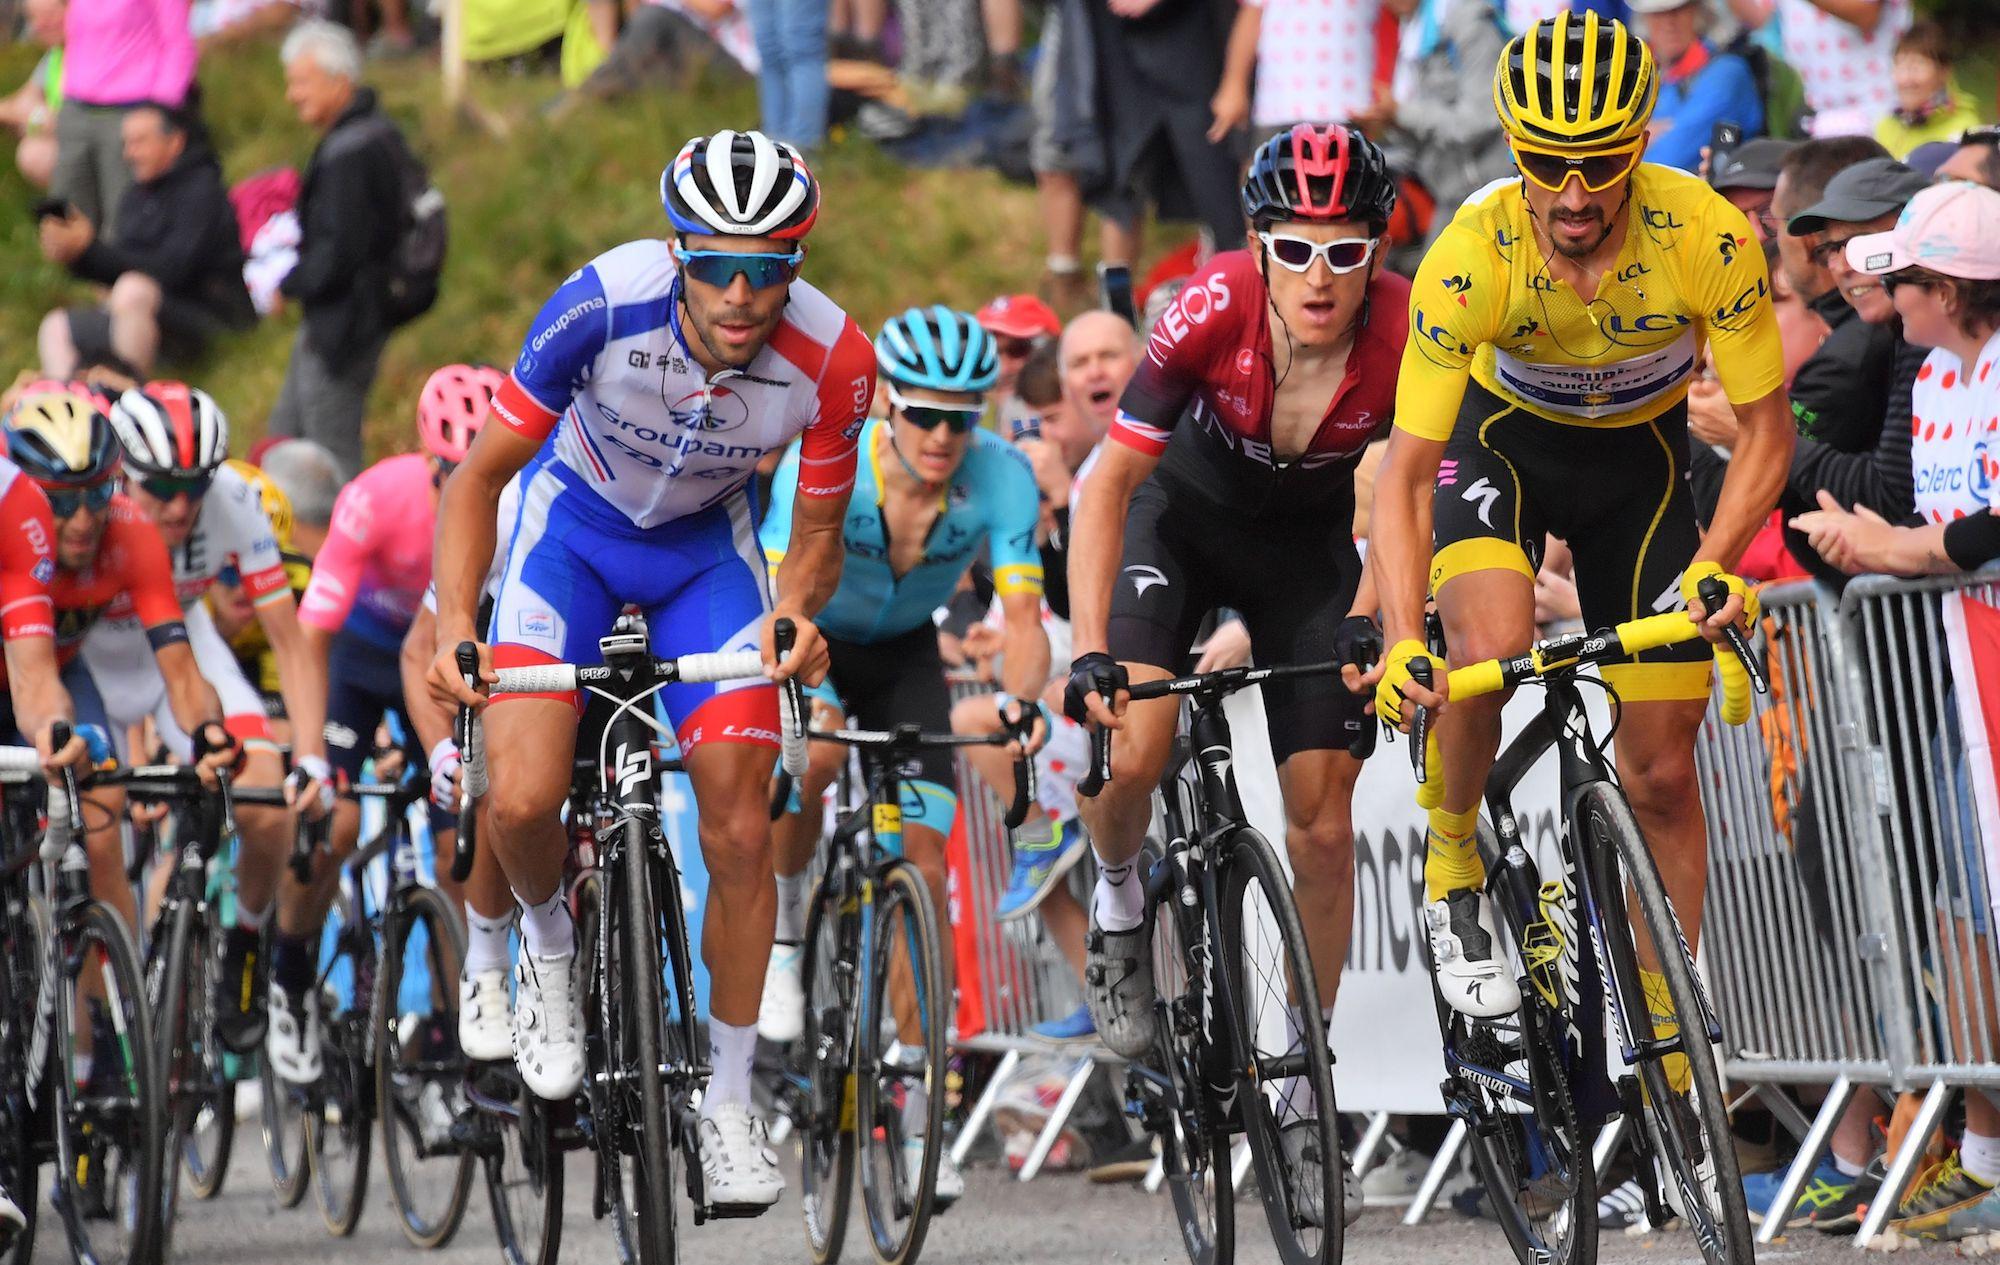 End of season ratings: How did each WorldTour team perform in 2019?